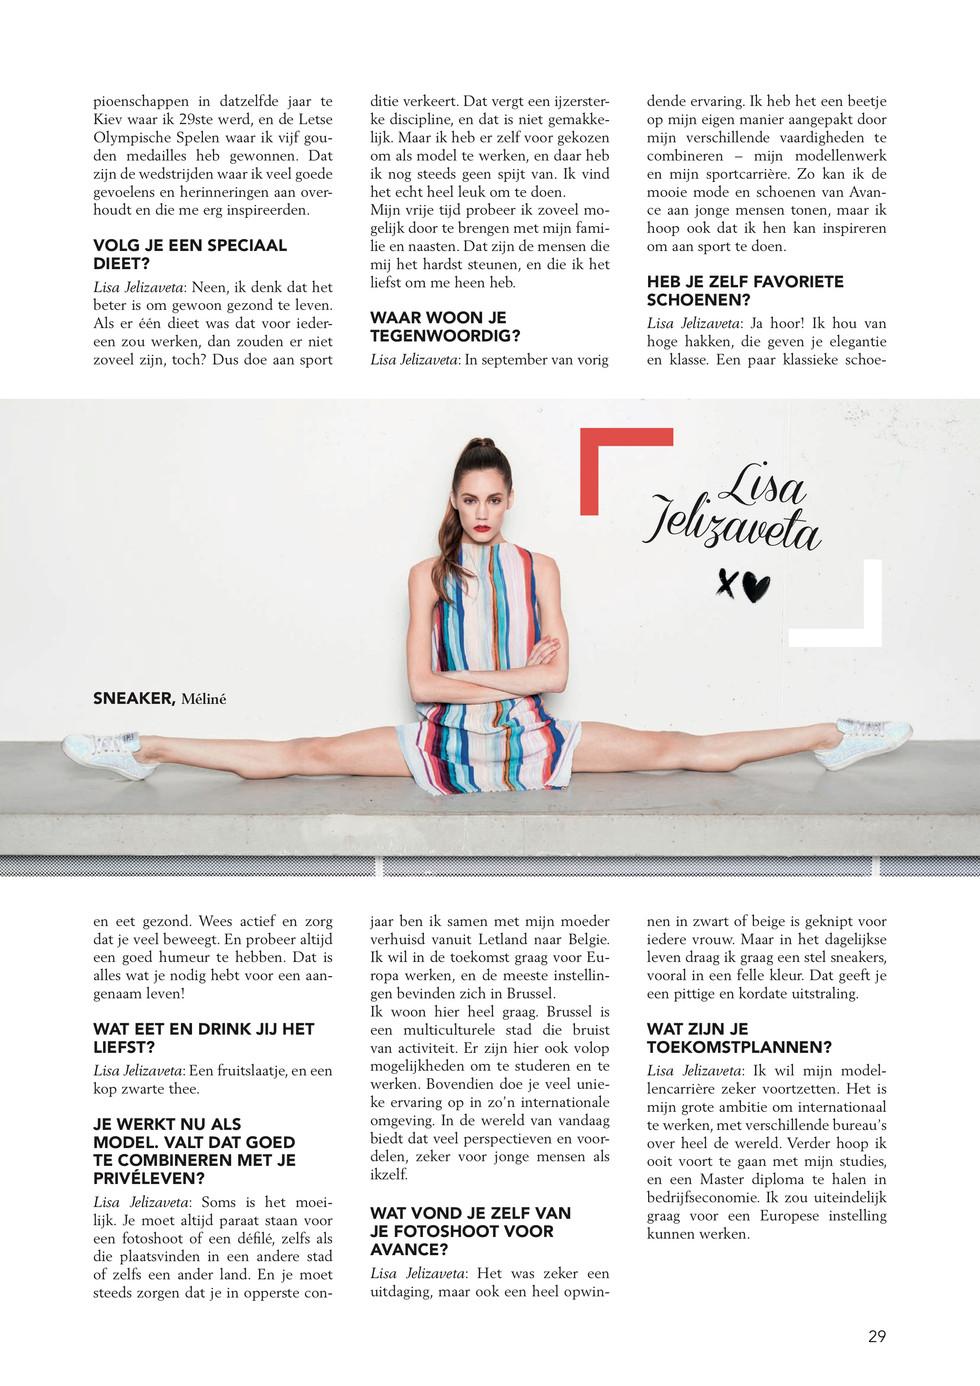 Avance_Magazine_Blader_HRES_29.jpg